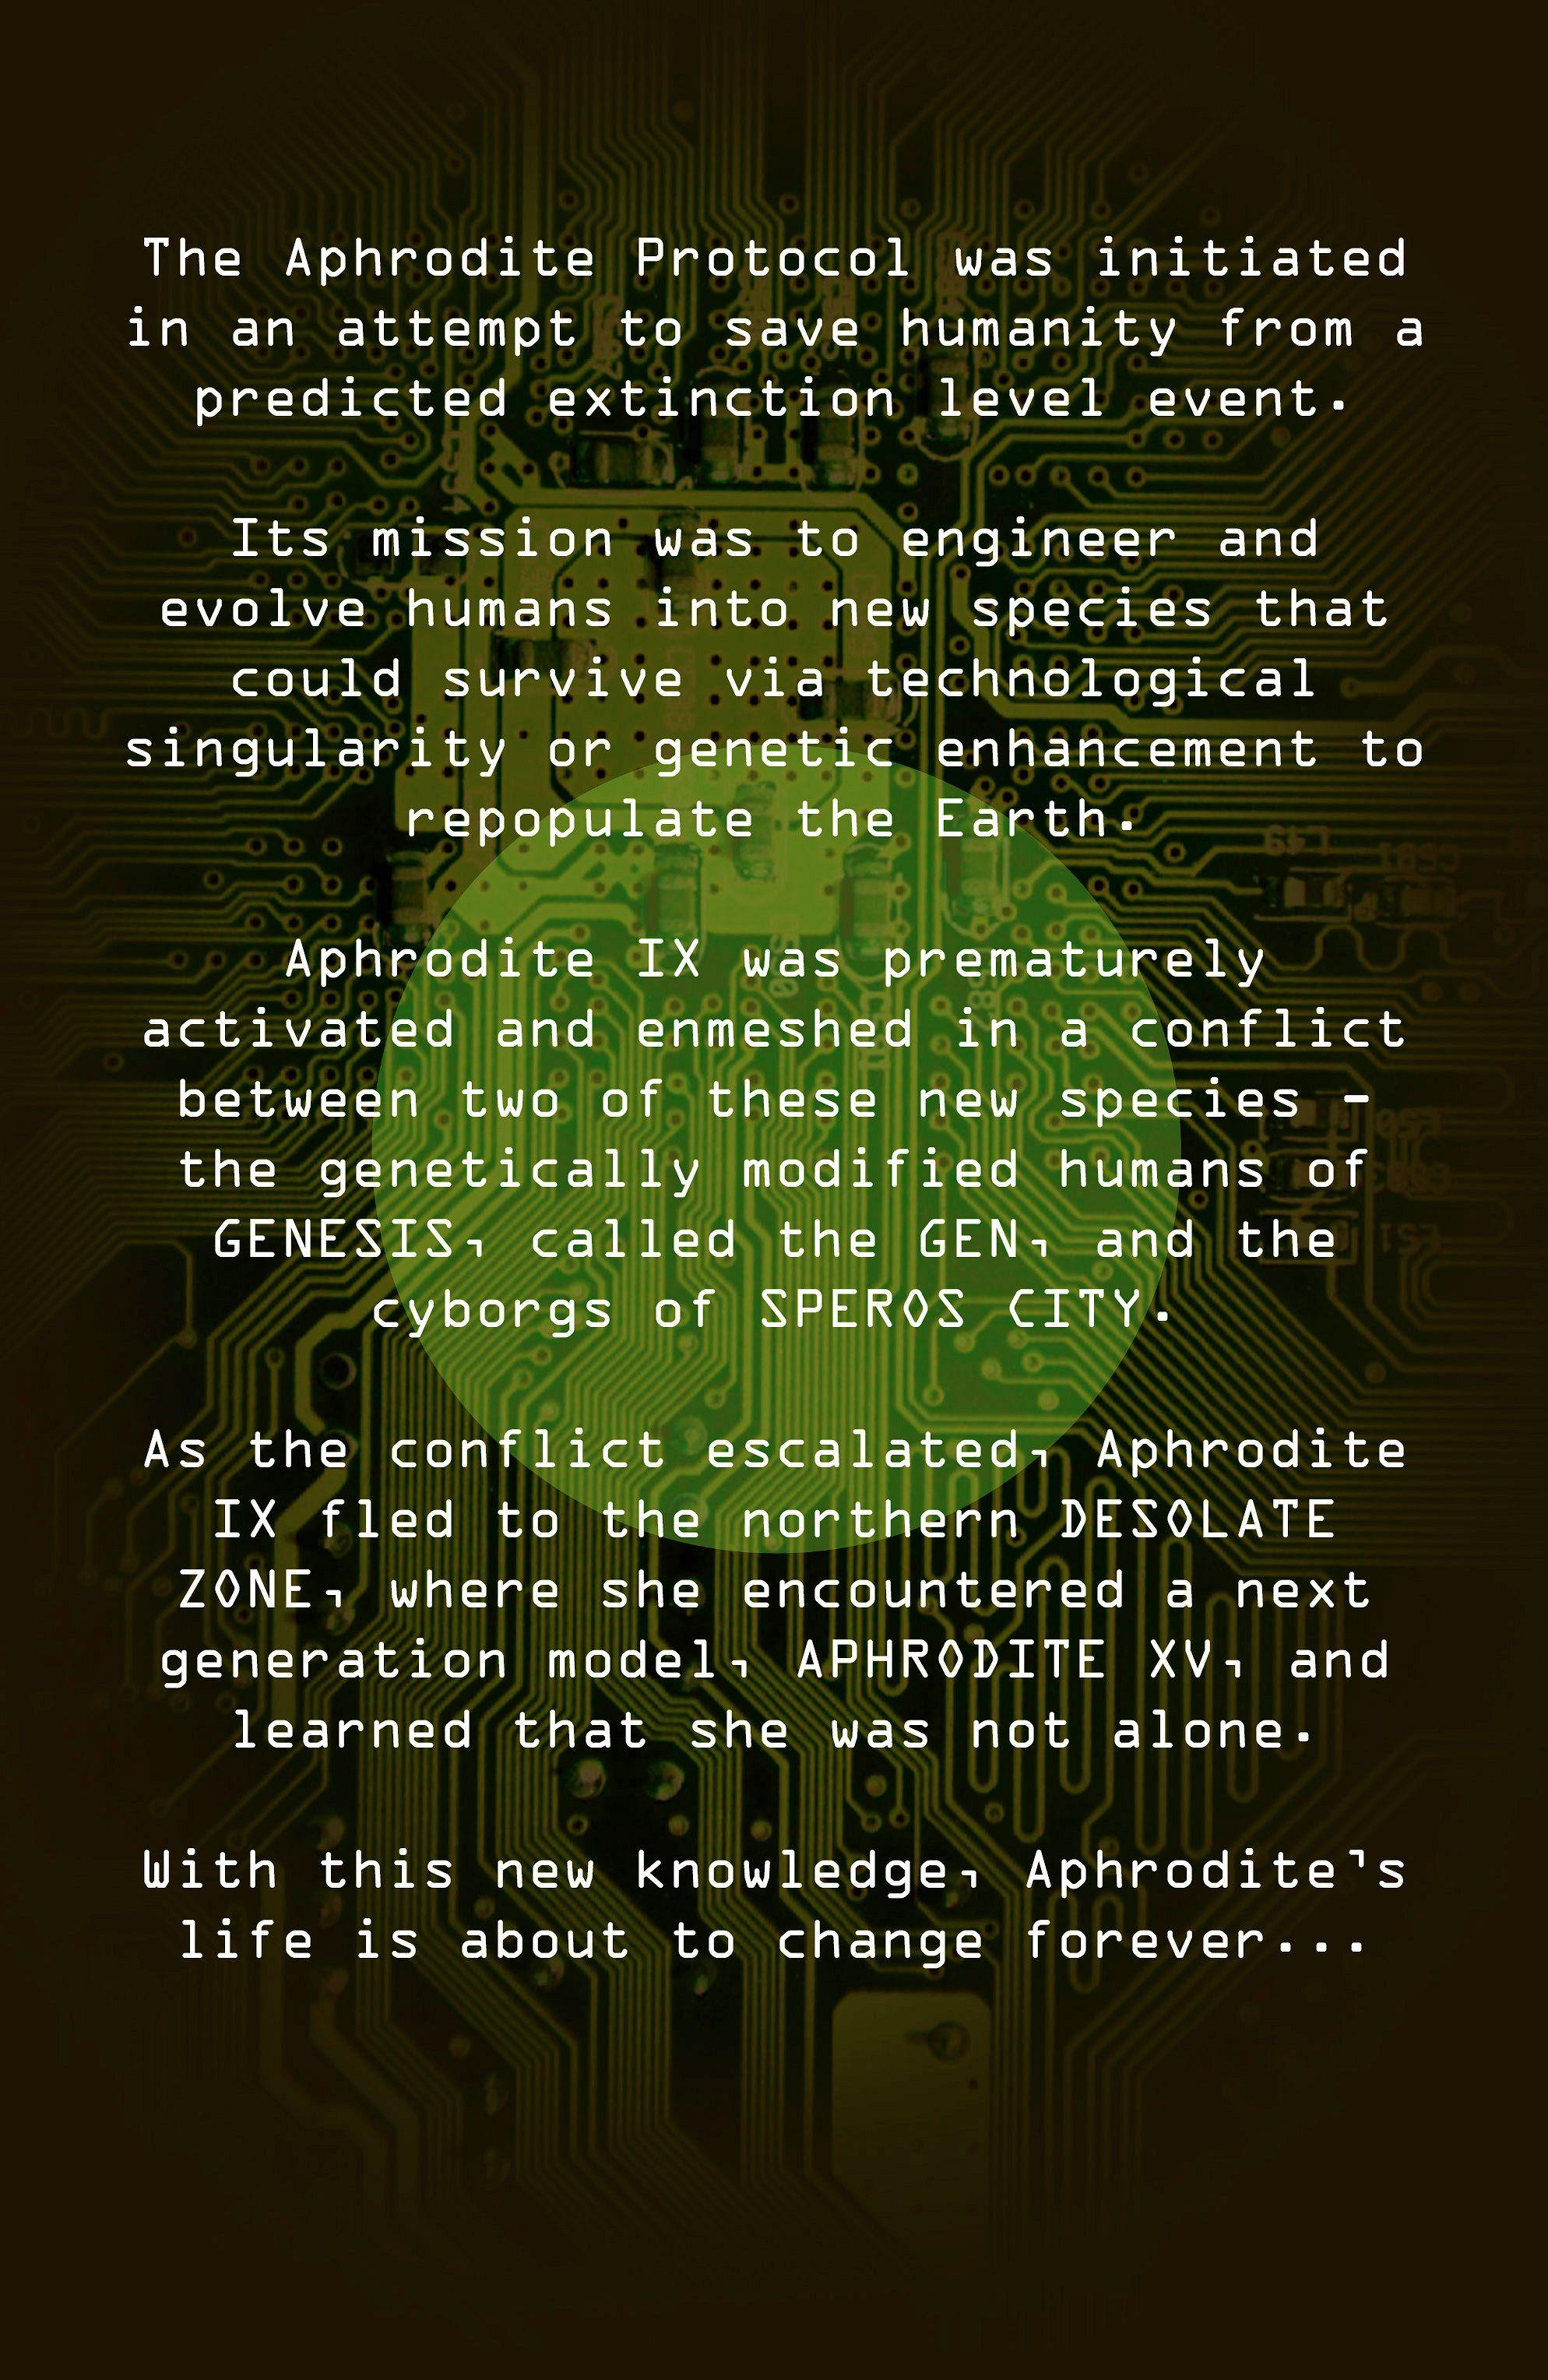 Read online Aphrodite IX (2013) comic -  Issue #10 - 3